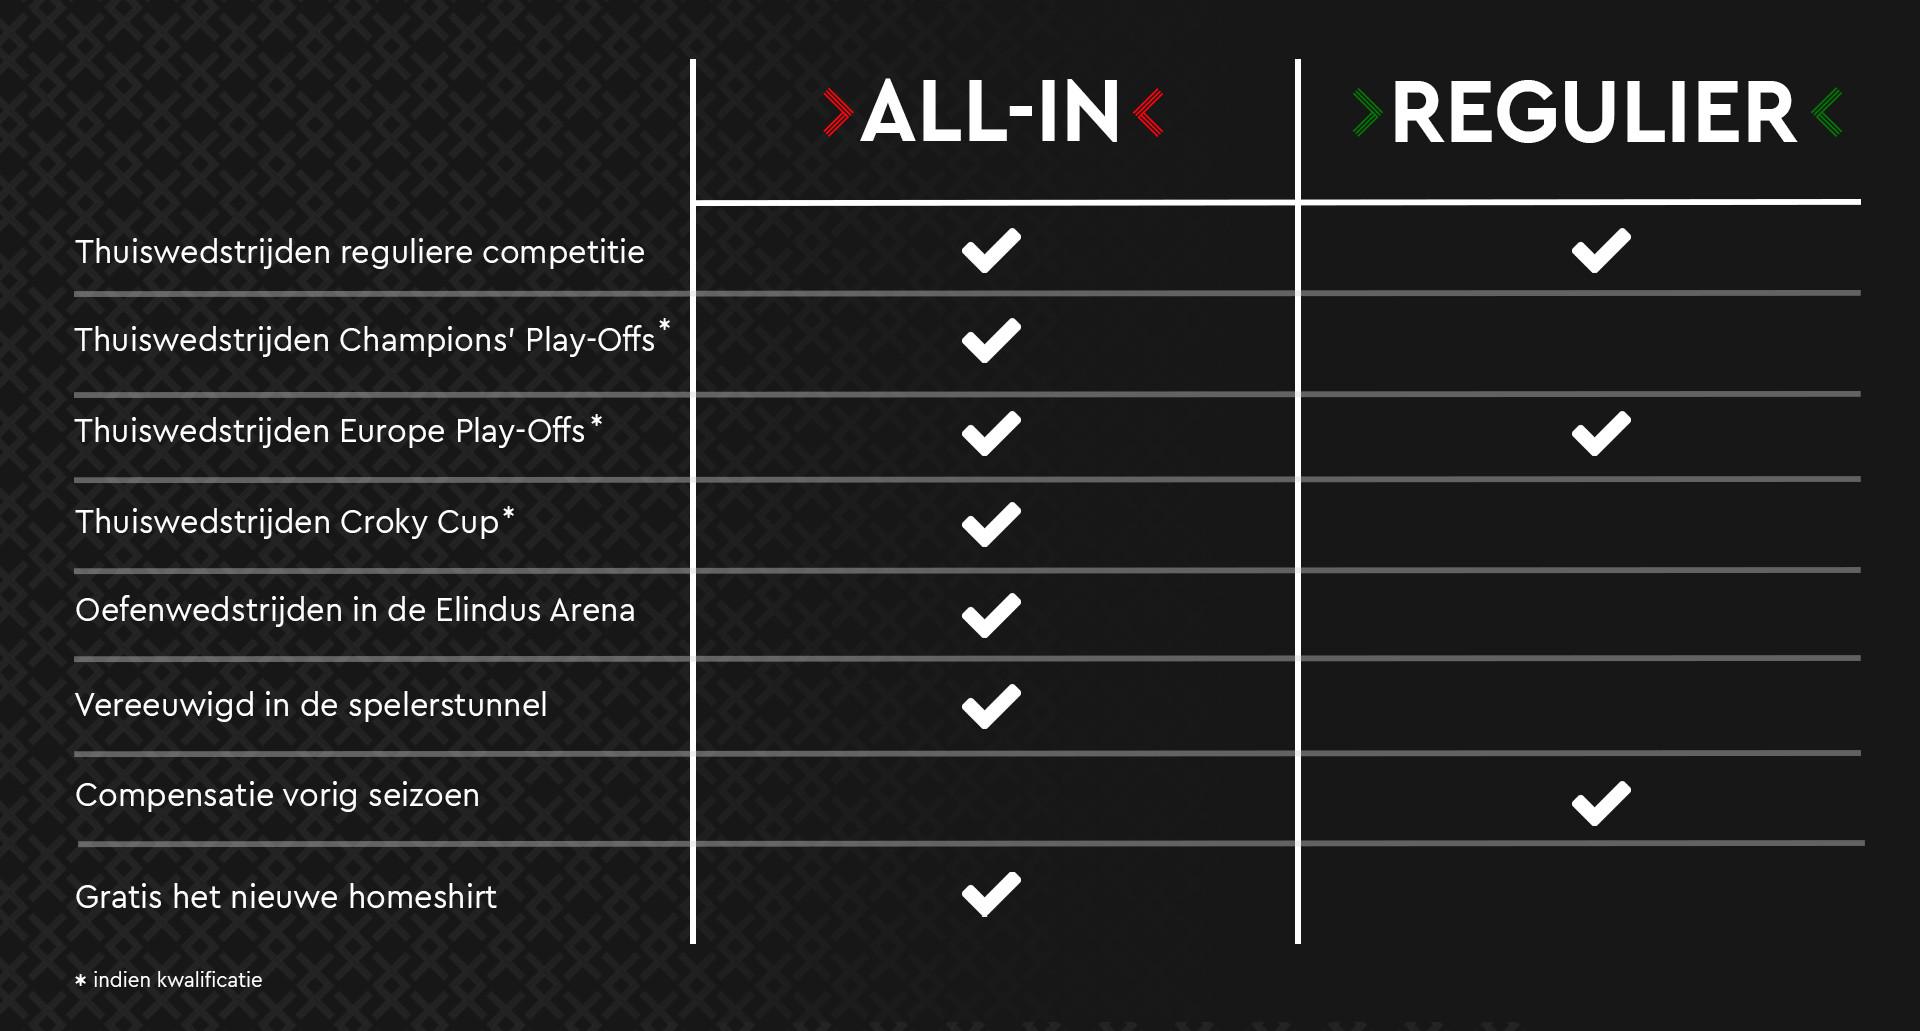 allin vs regulier_update